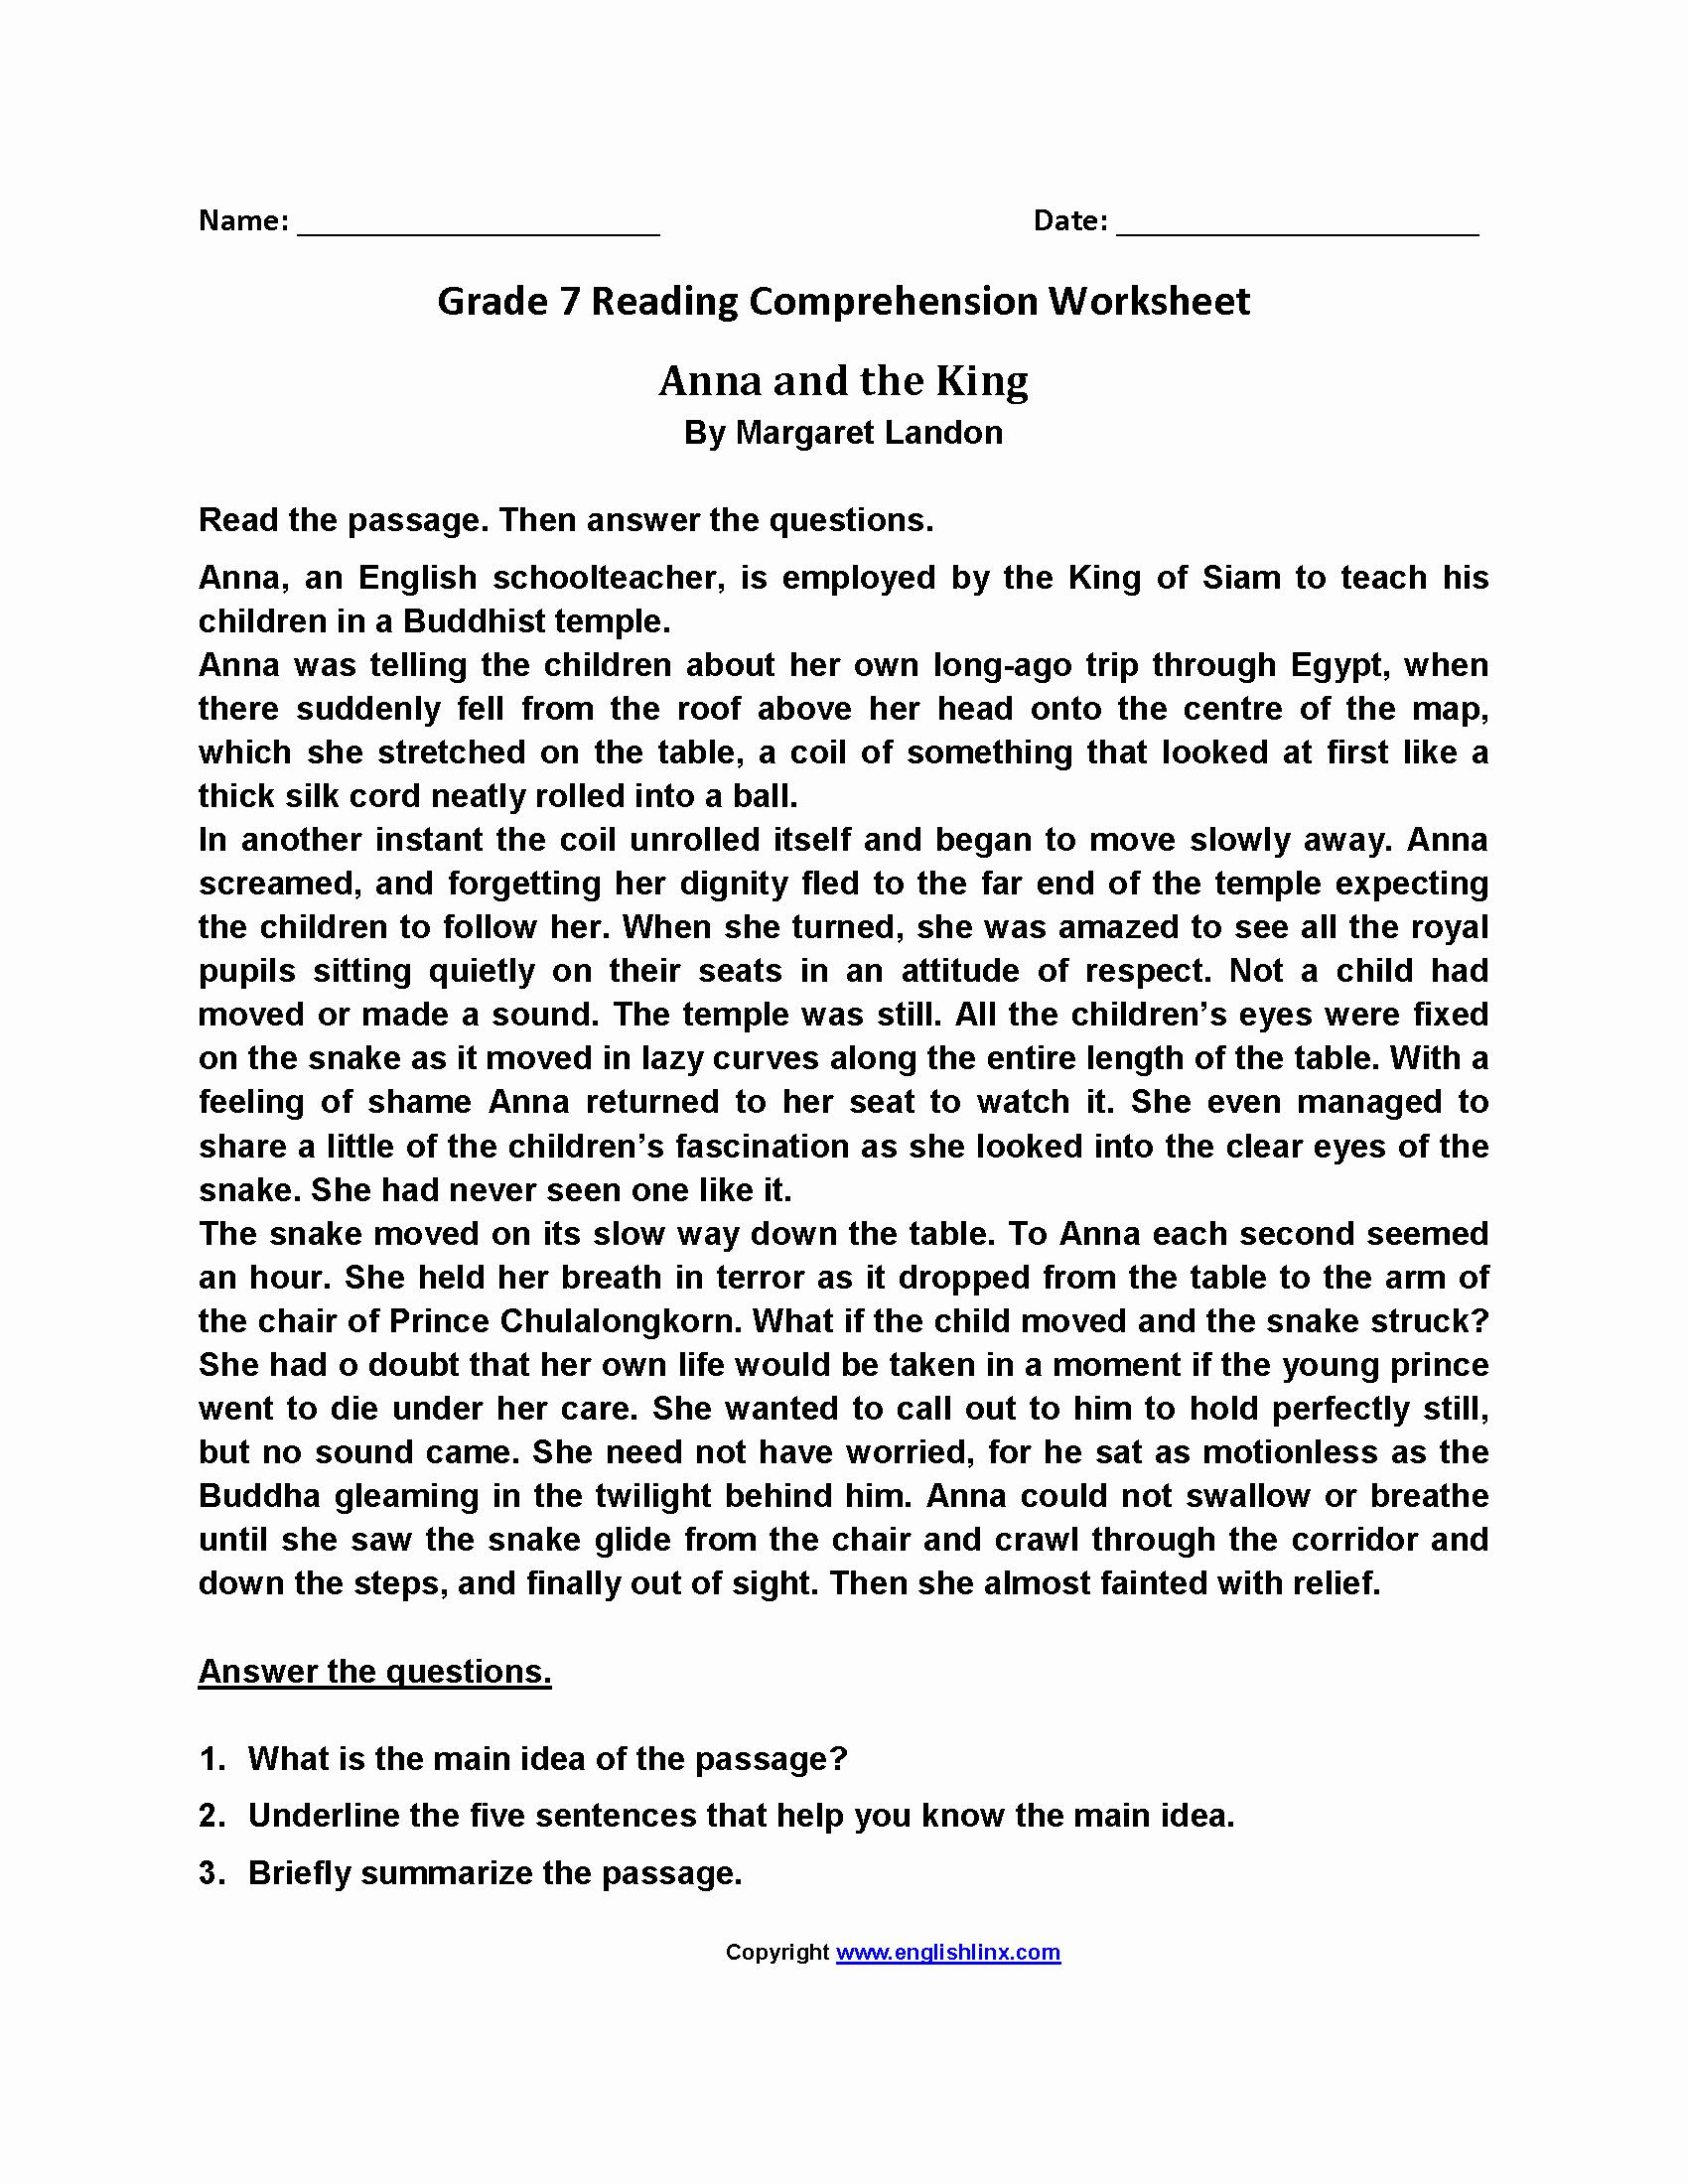 7th Grade Grammar Worksheets Pdf Unique 7th Grade Reading Prehension Worksheets Pdf